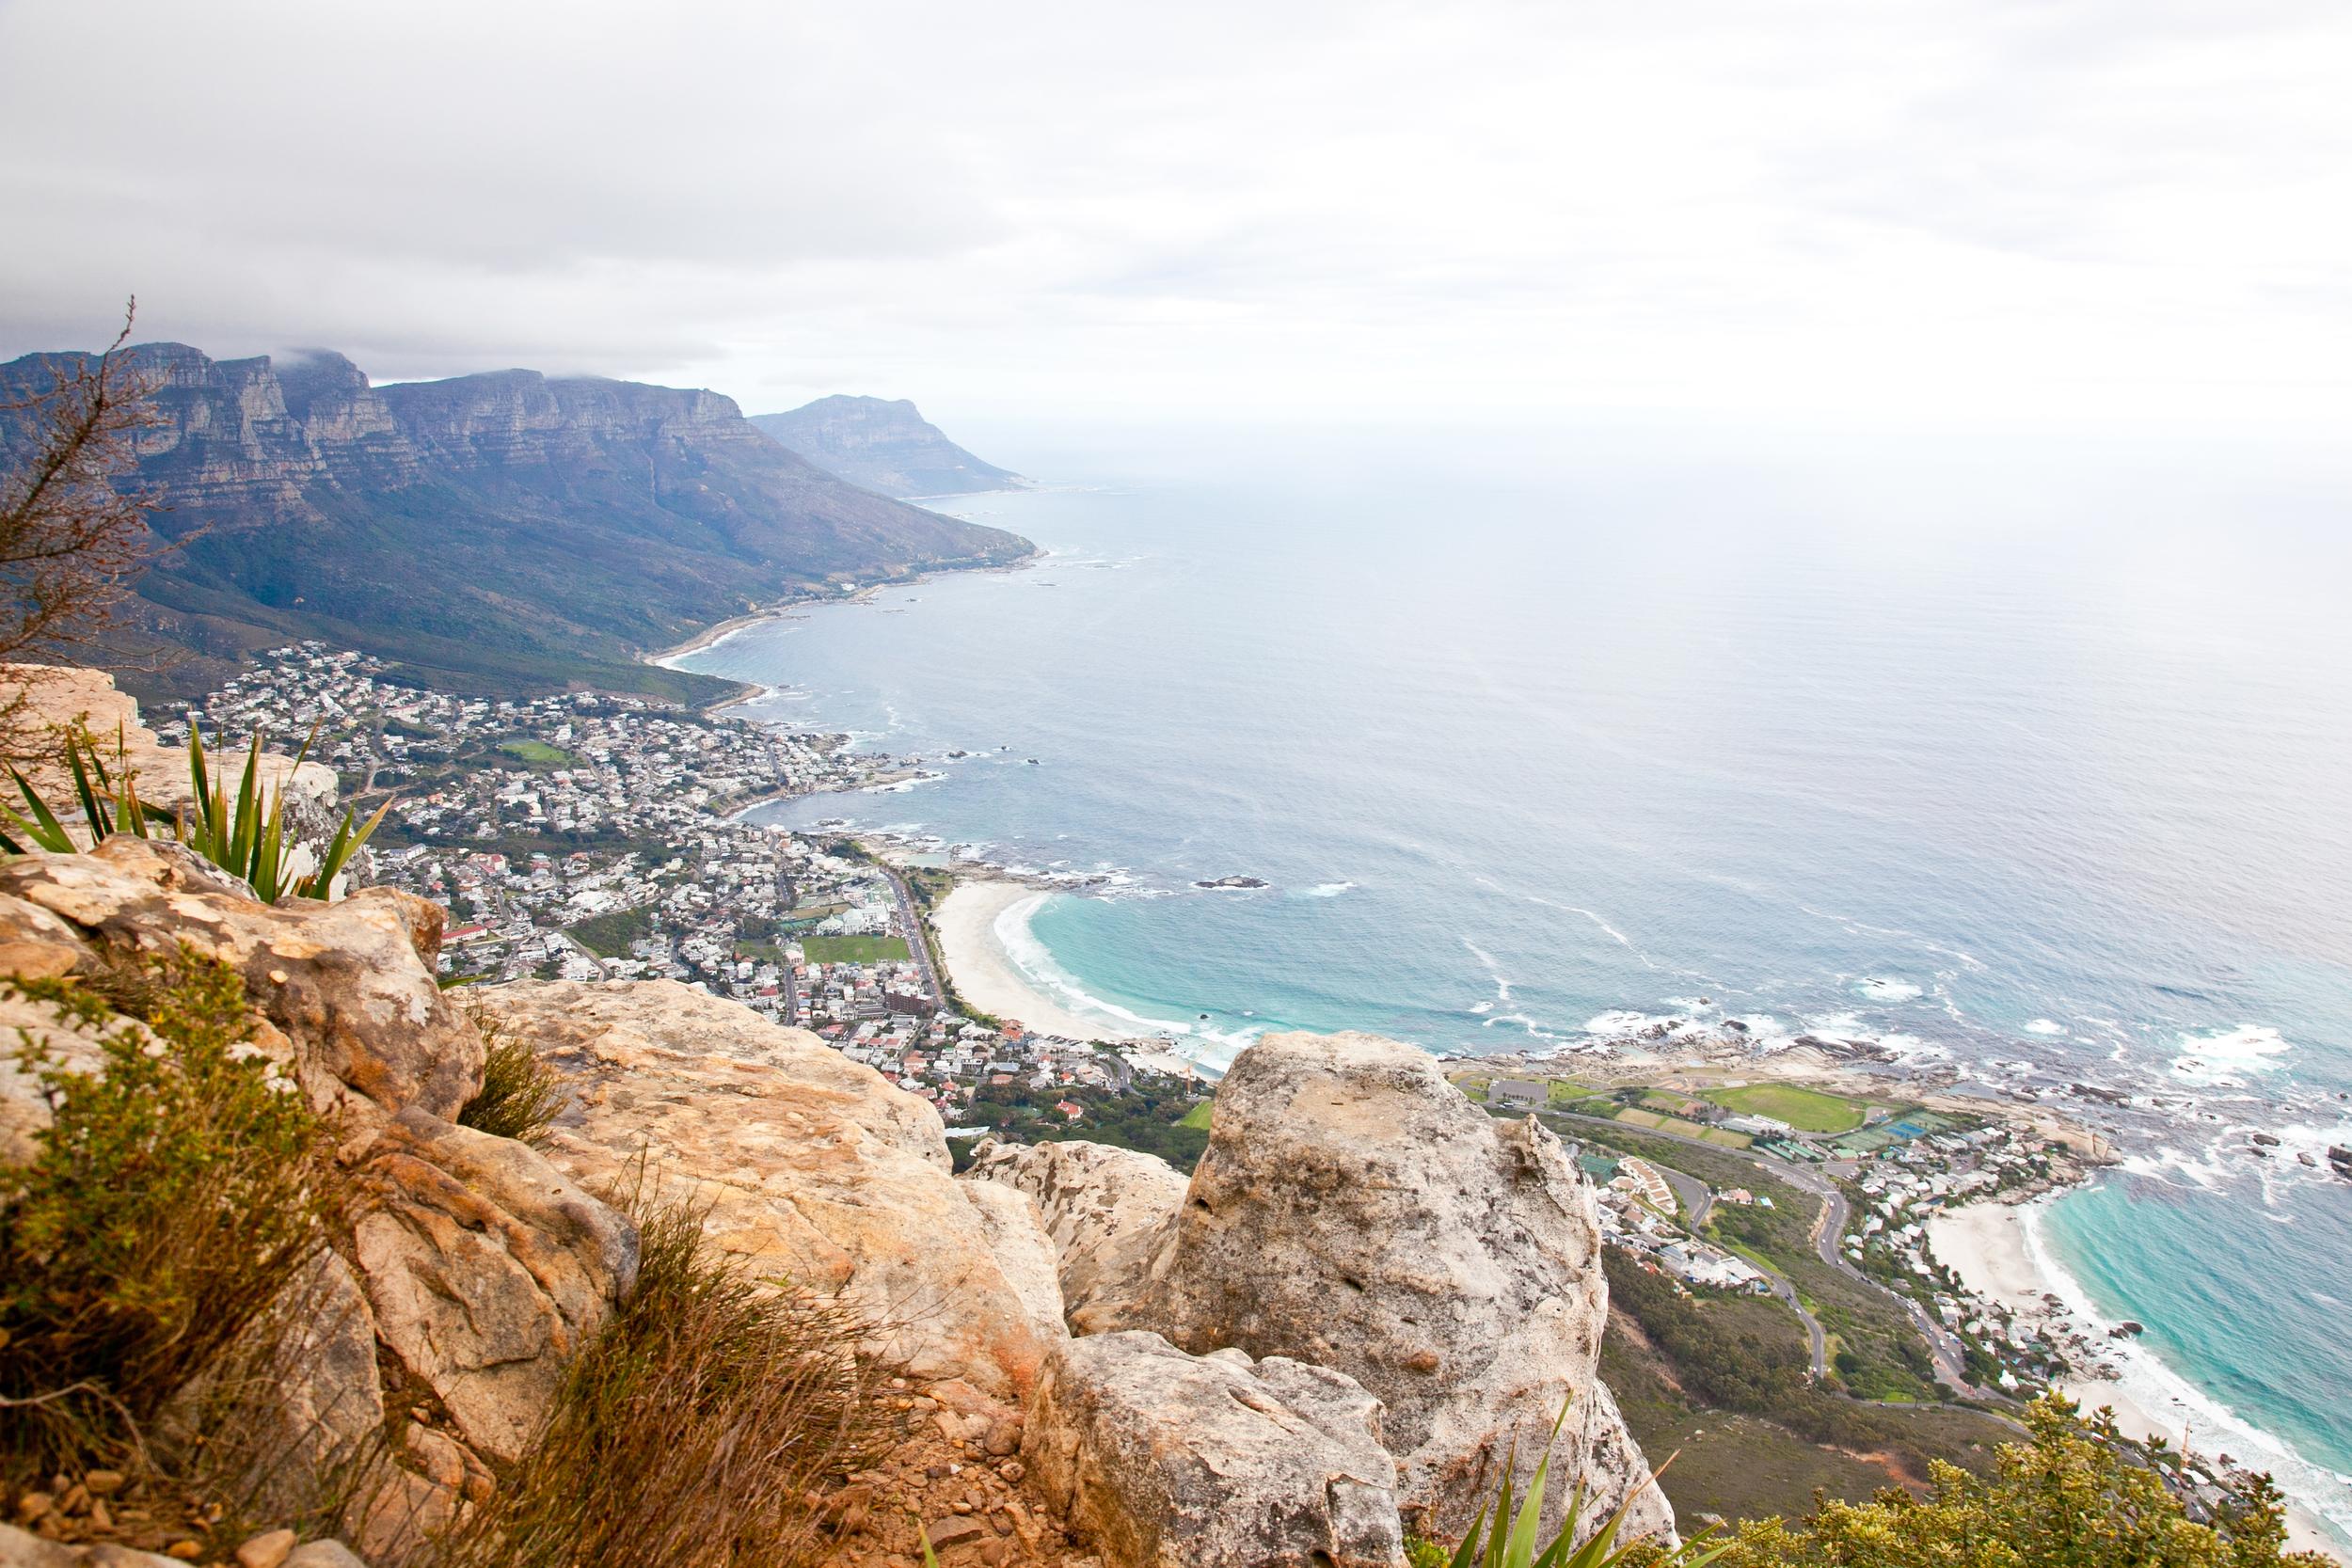 IMG_5097-hiking-lions-head-cape-town-trisa-taro.jpg